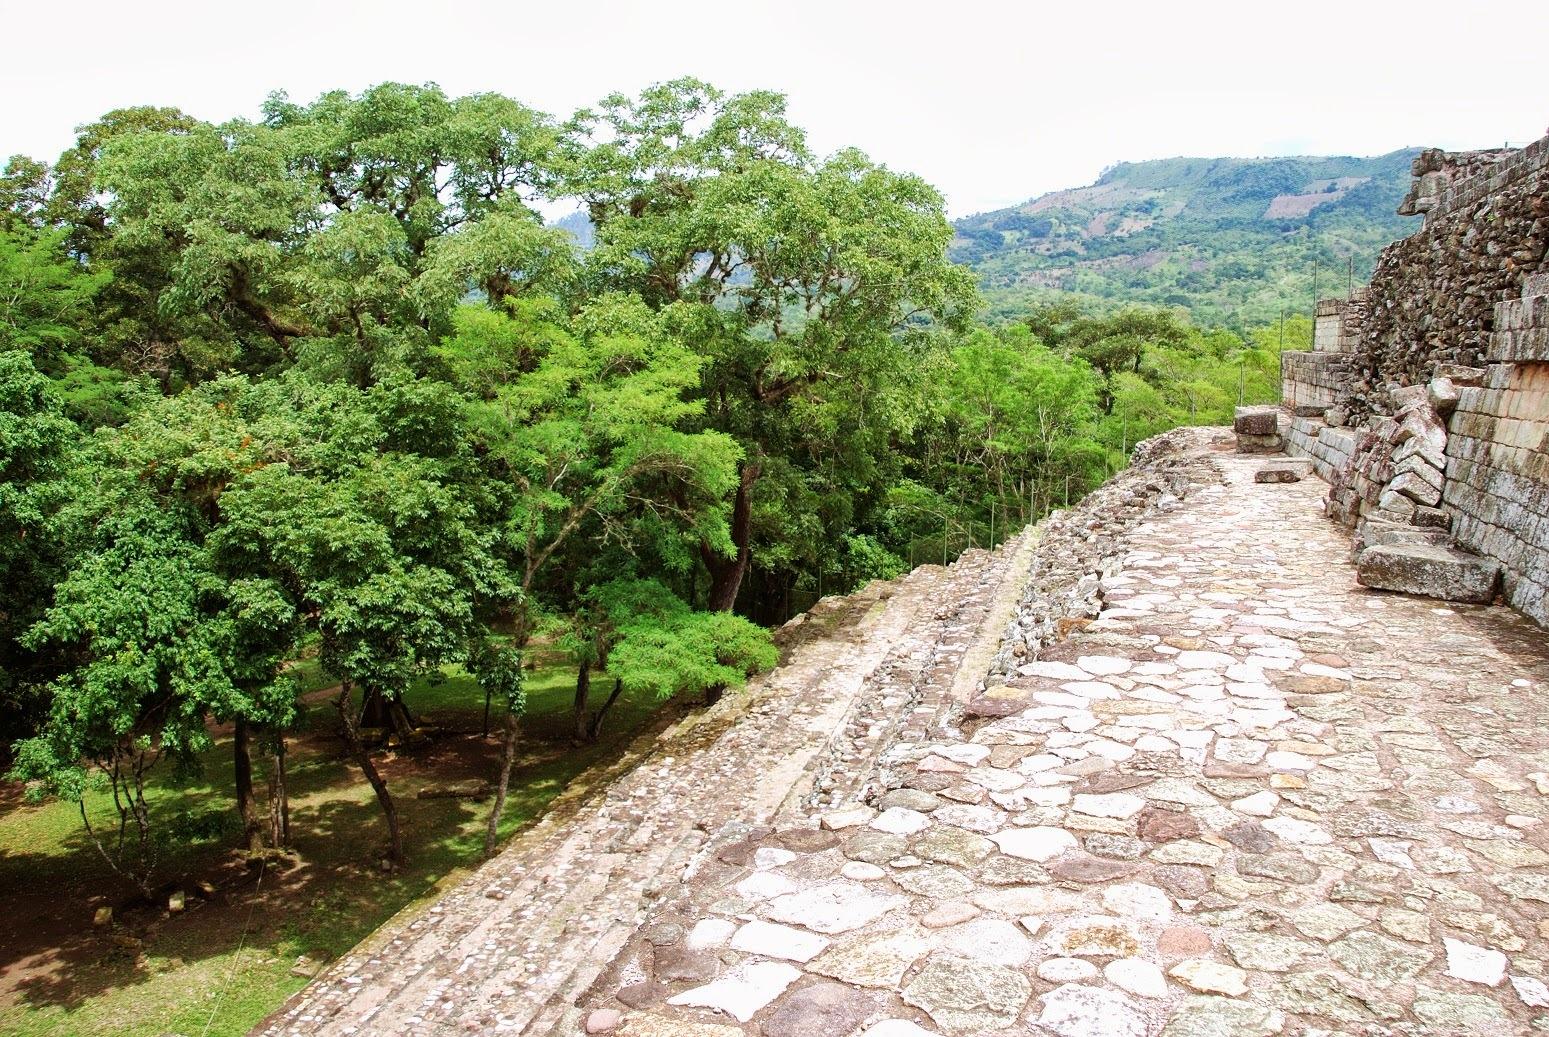 Honduras - Ruiny w Copan